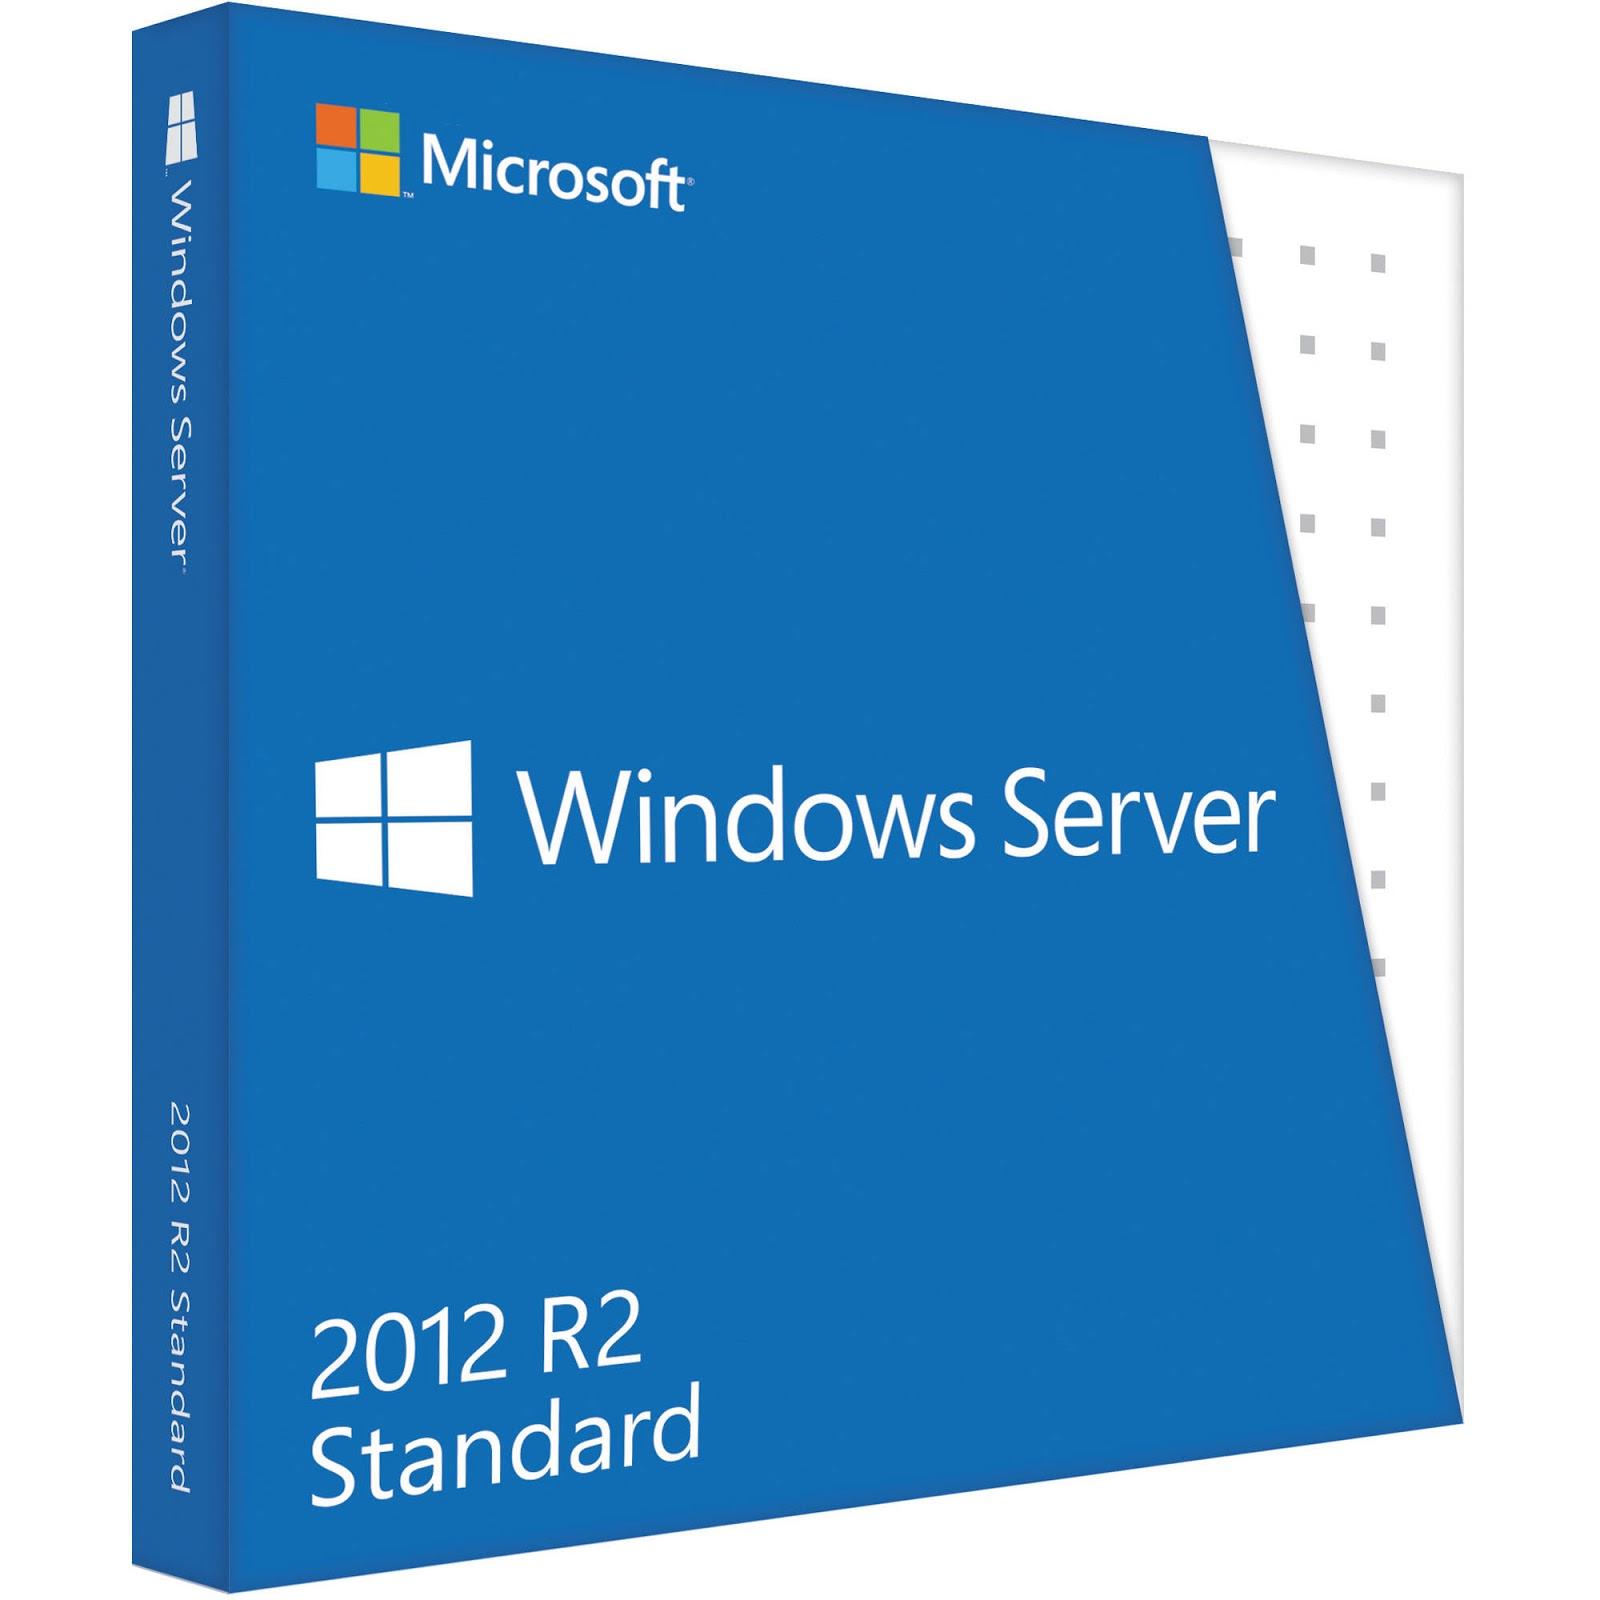 windows server 2012 r2 standard iso trial